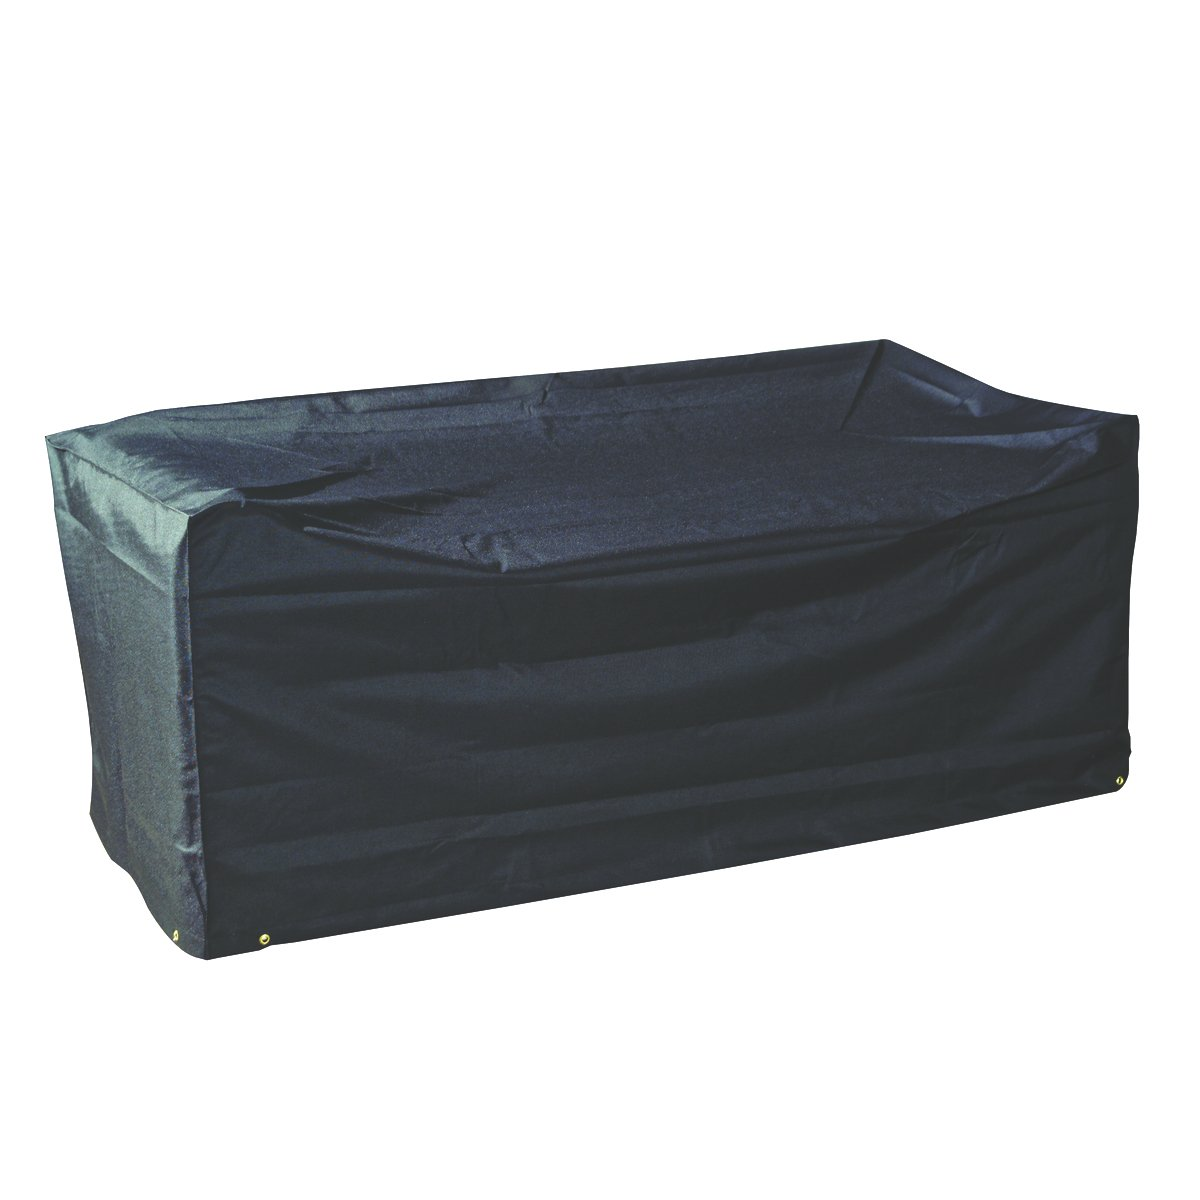 Bosmere M690 Copri per sofài grandi dimensioni